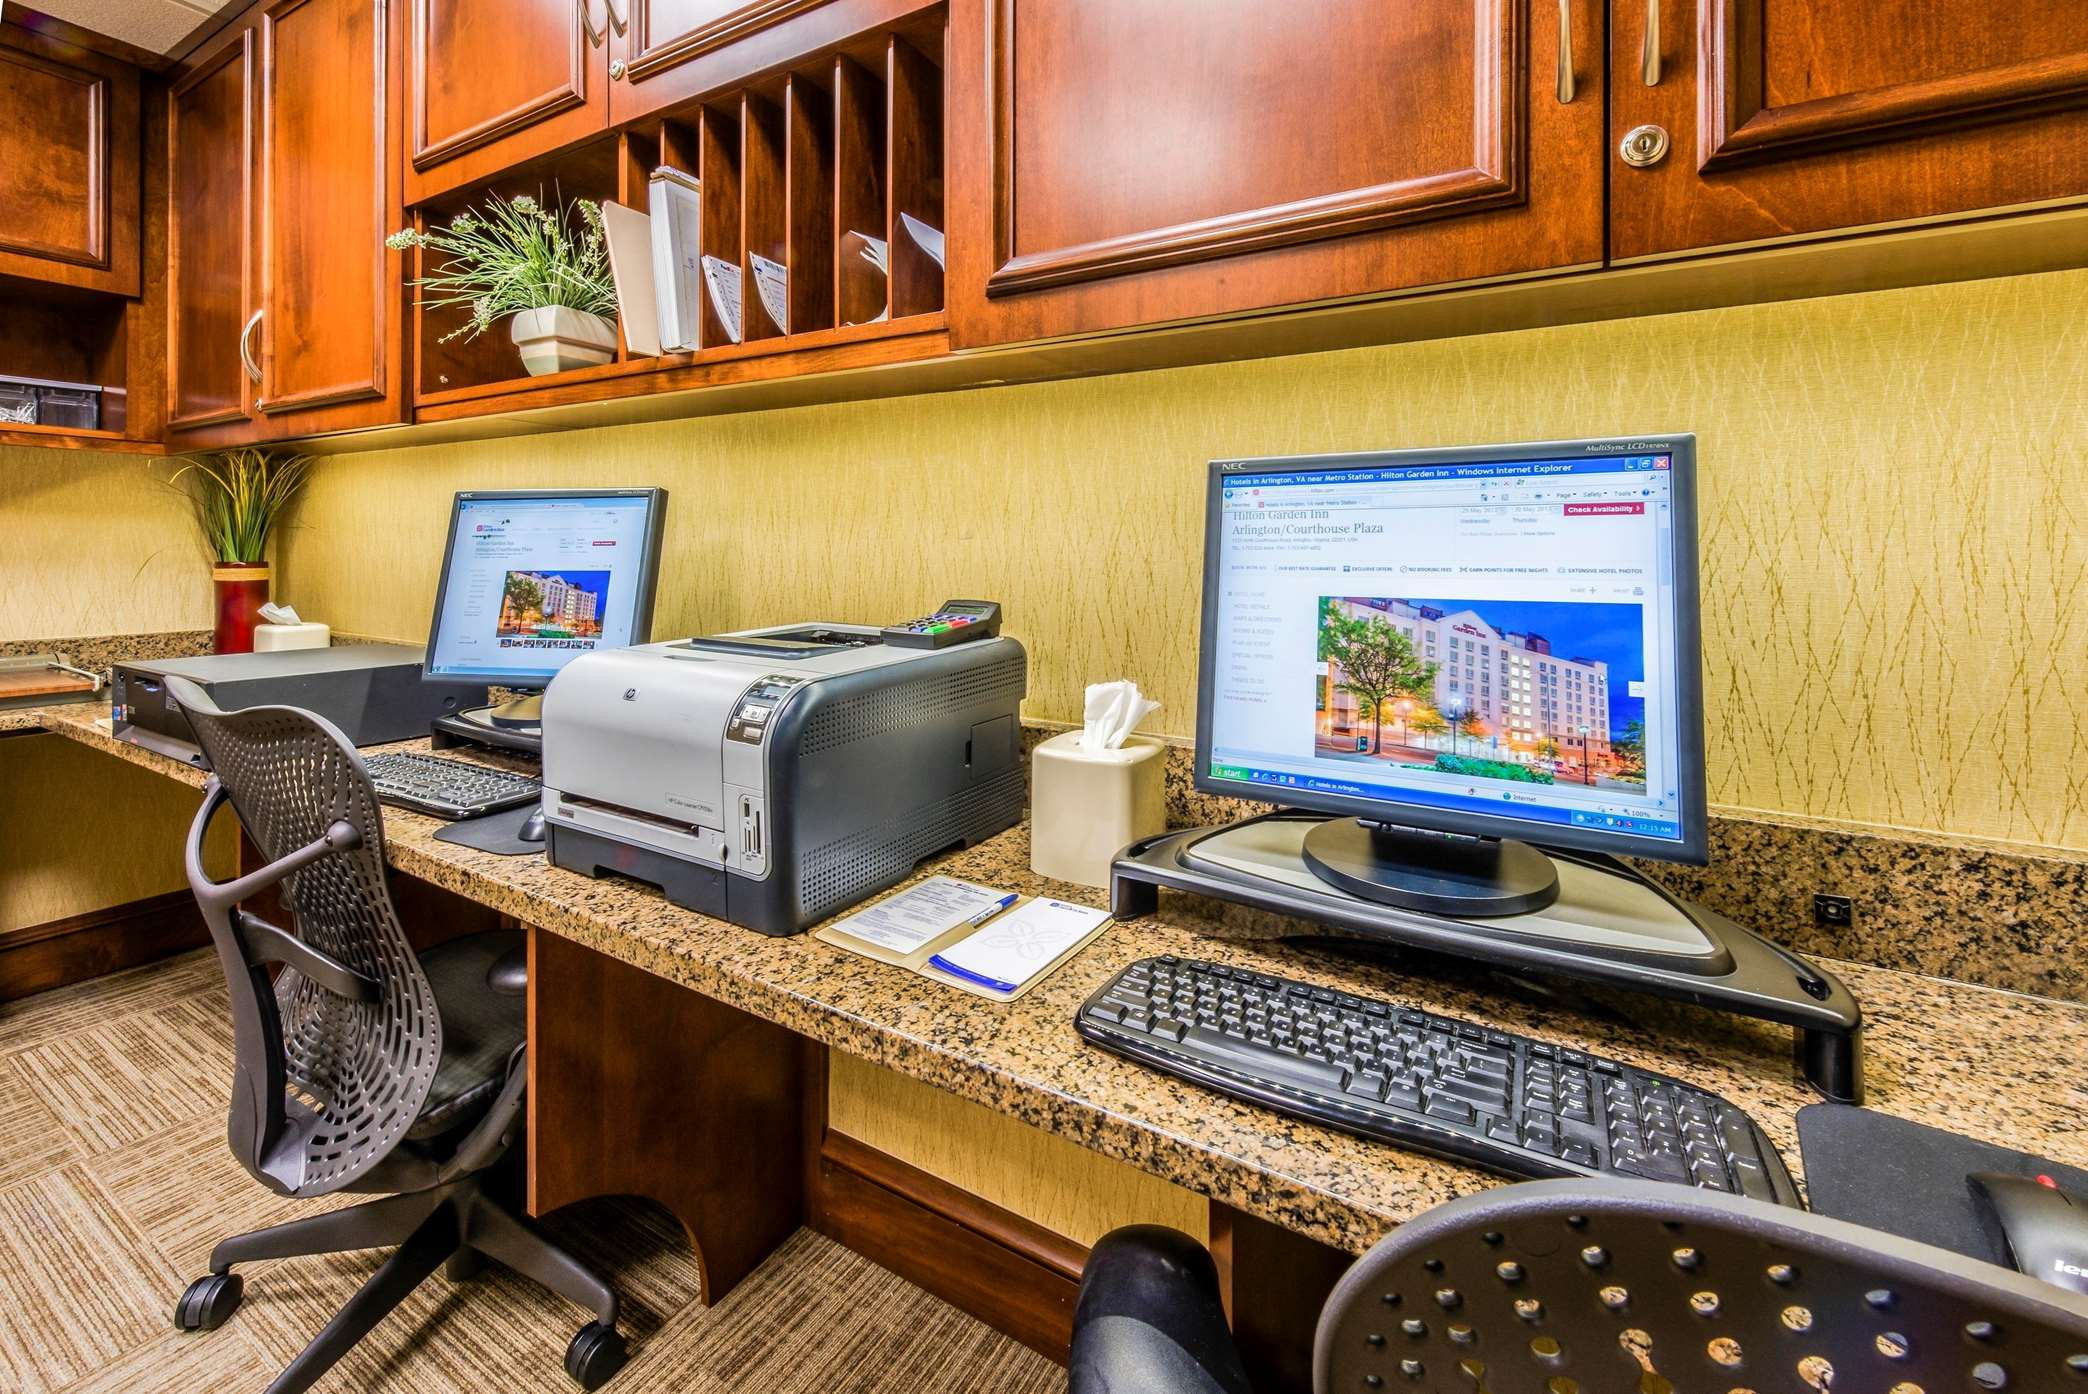 Hilton Garden Inn Arlington/Courthouse Plaza image 10